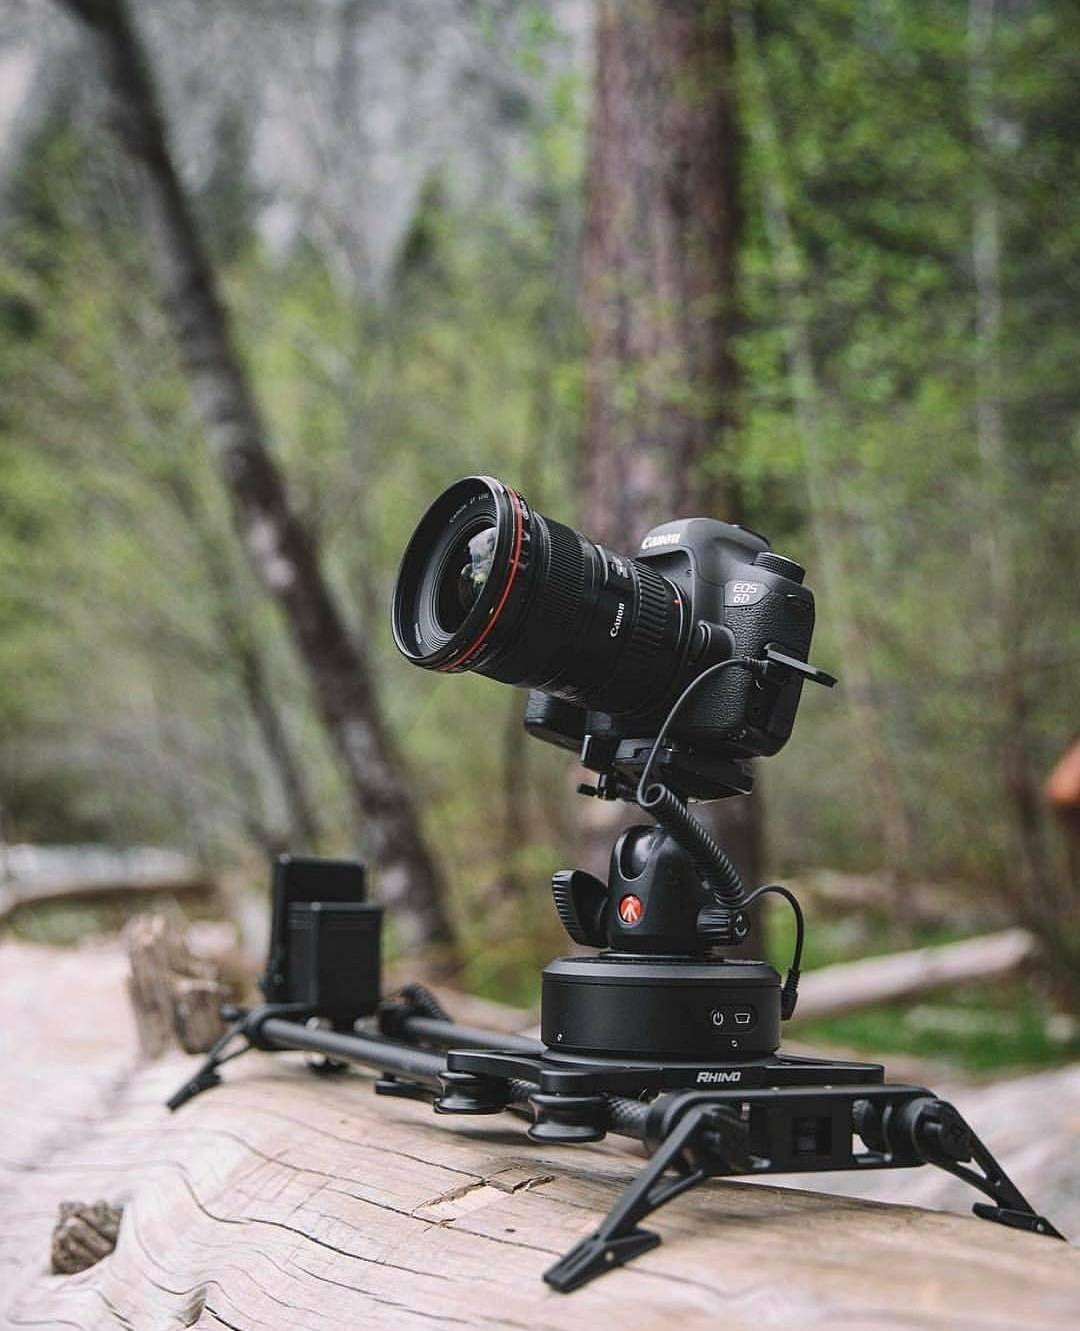 200 Frenzy Photos Ideas Photography And Videography Videography Photography